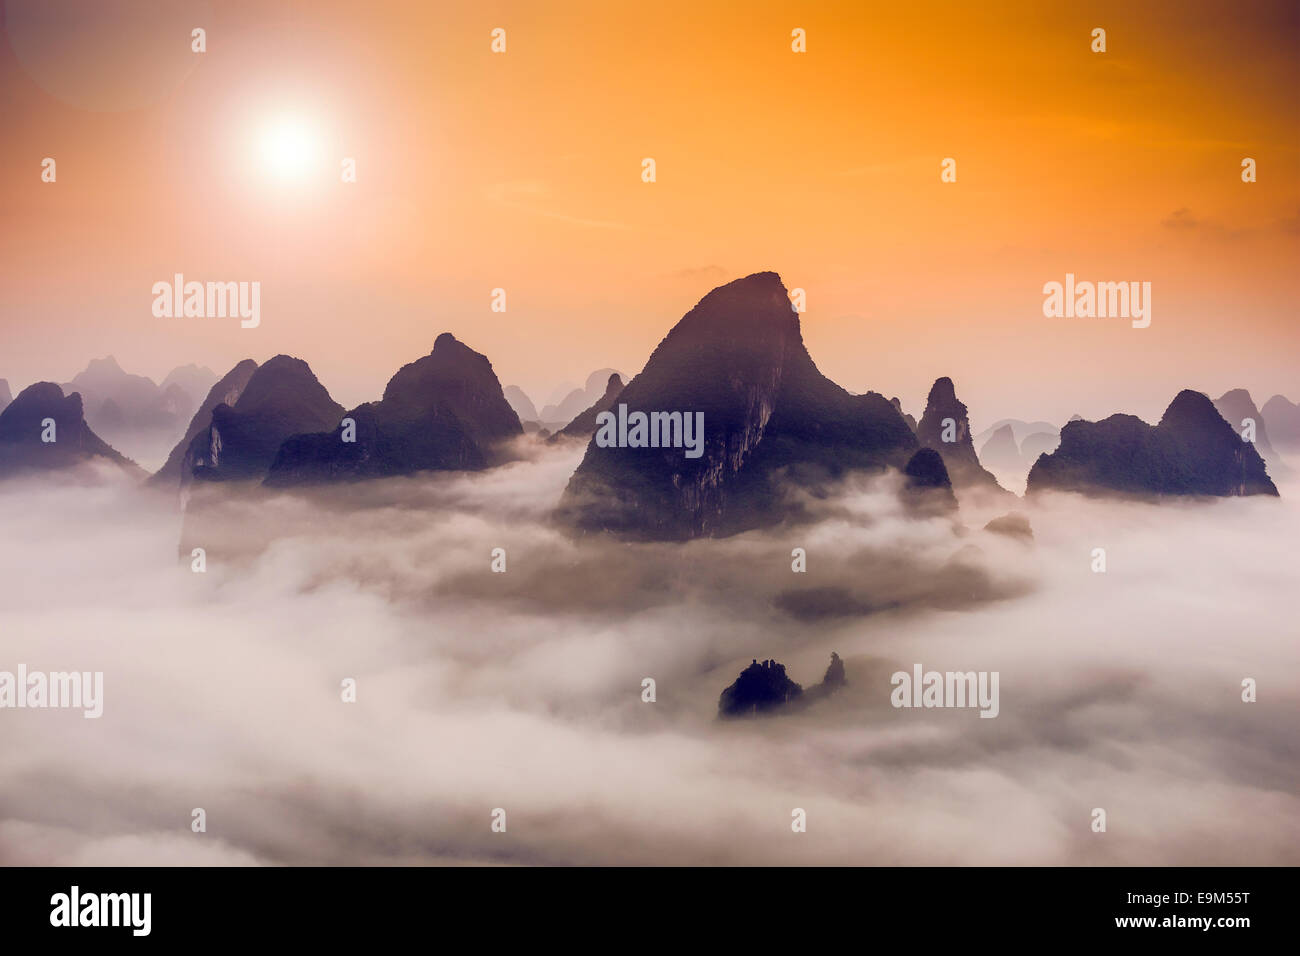 Karstberge von Xingping, China. Stockbild